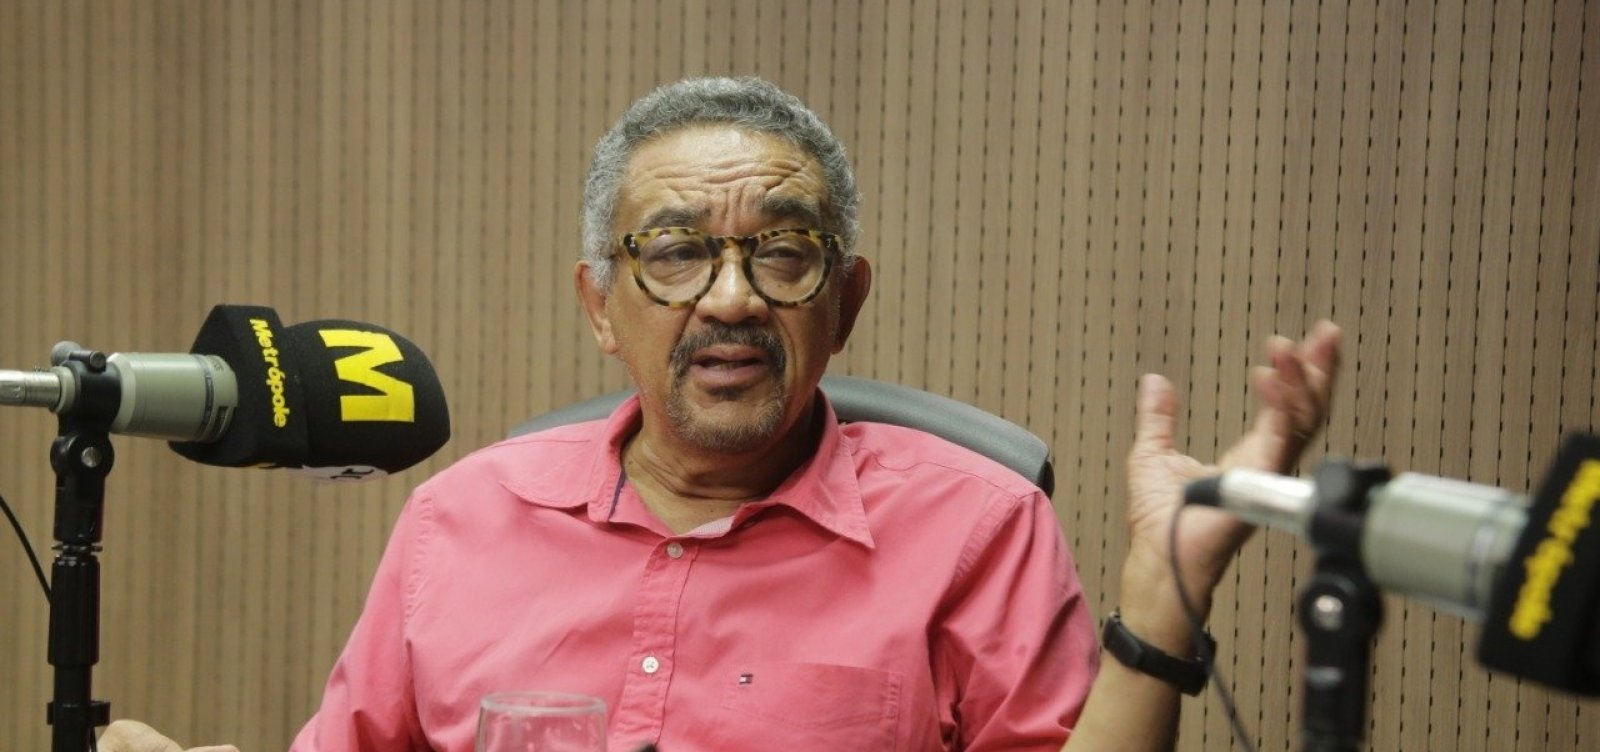 'O grotesco chegou ao poder no Brasil, no Planalto', acredita Muniz Sodré